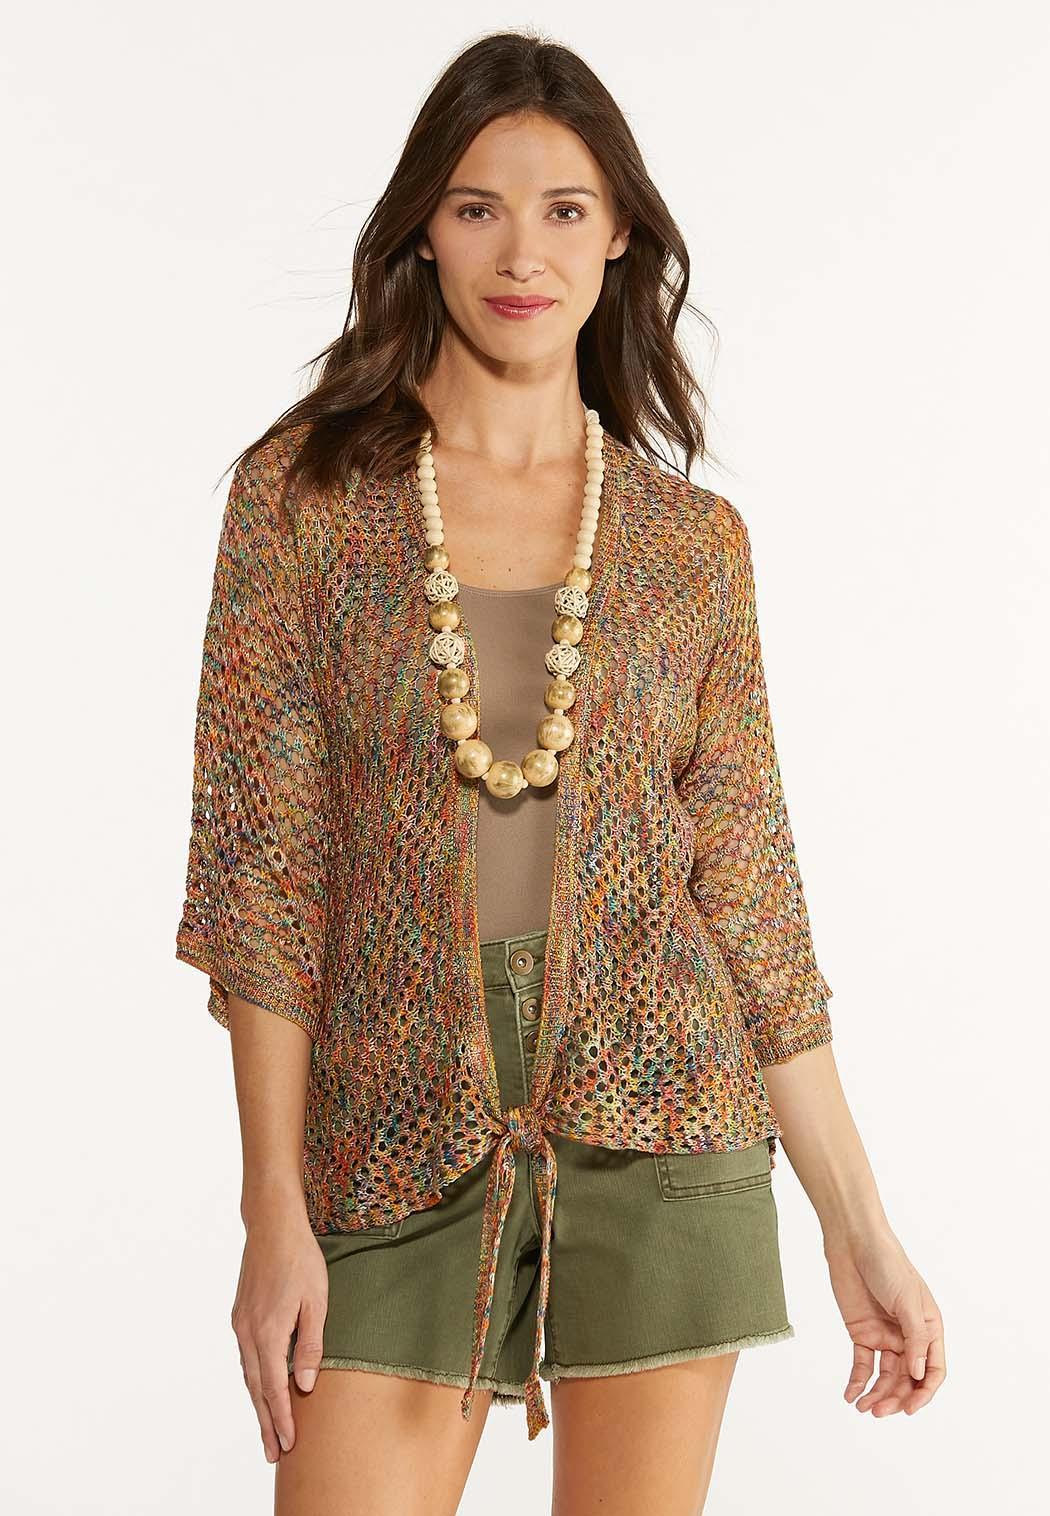 Plus Size Rainbow Cardigan Sweater